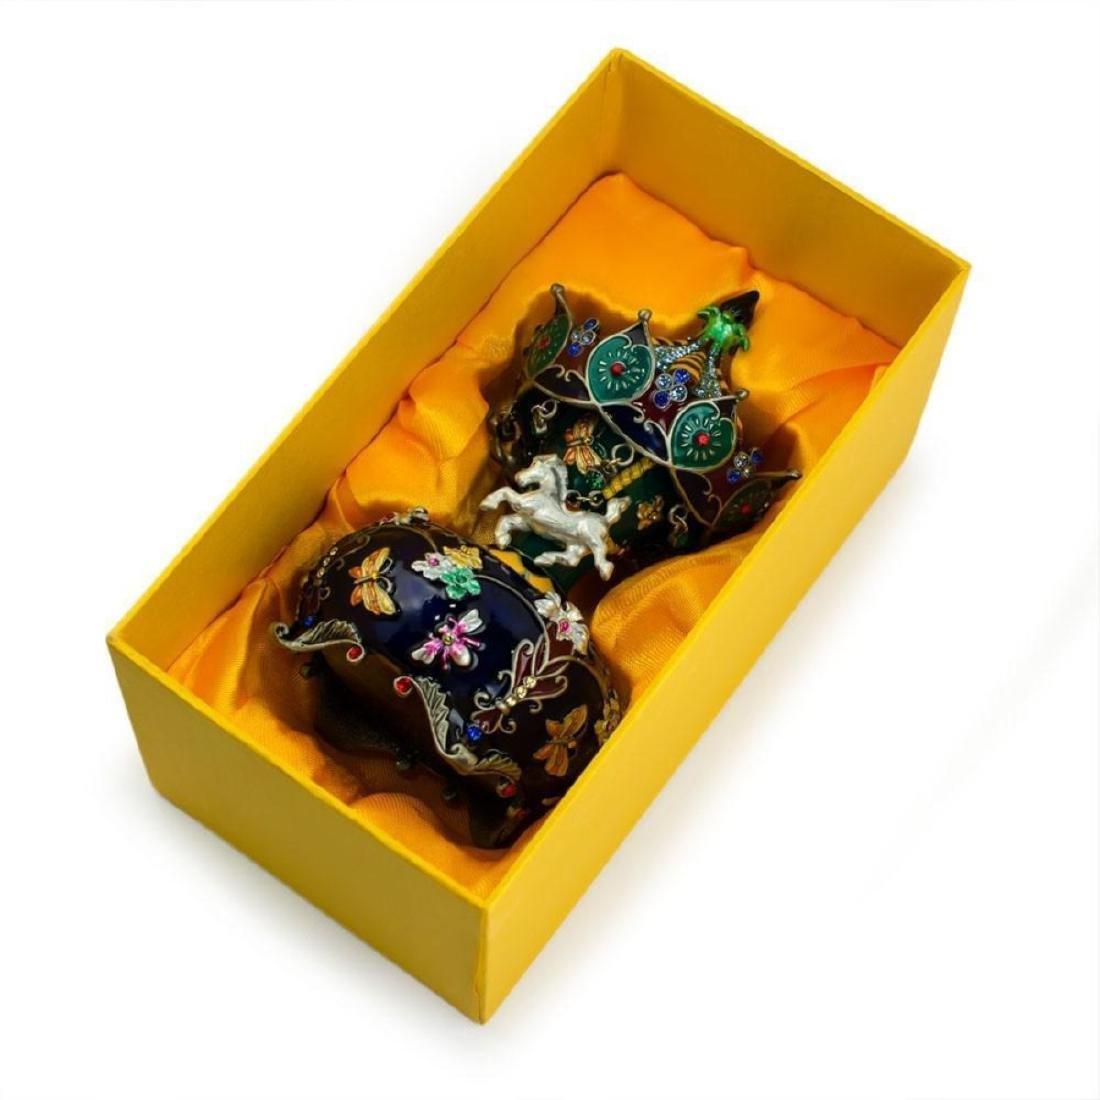 Jeweled Royal Inspired Russian Carousel Figurine 5.5 - 3